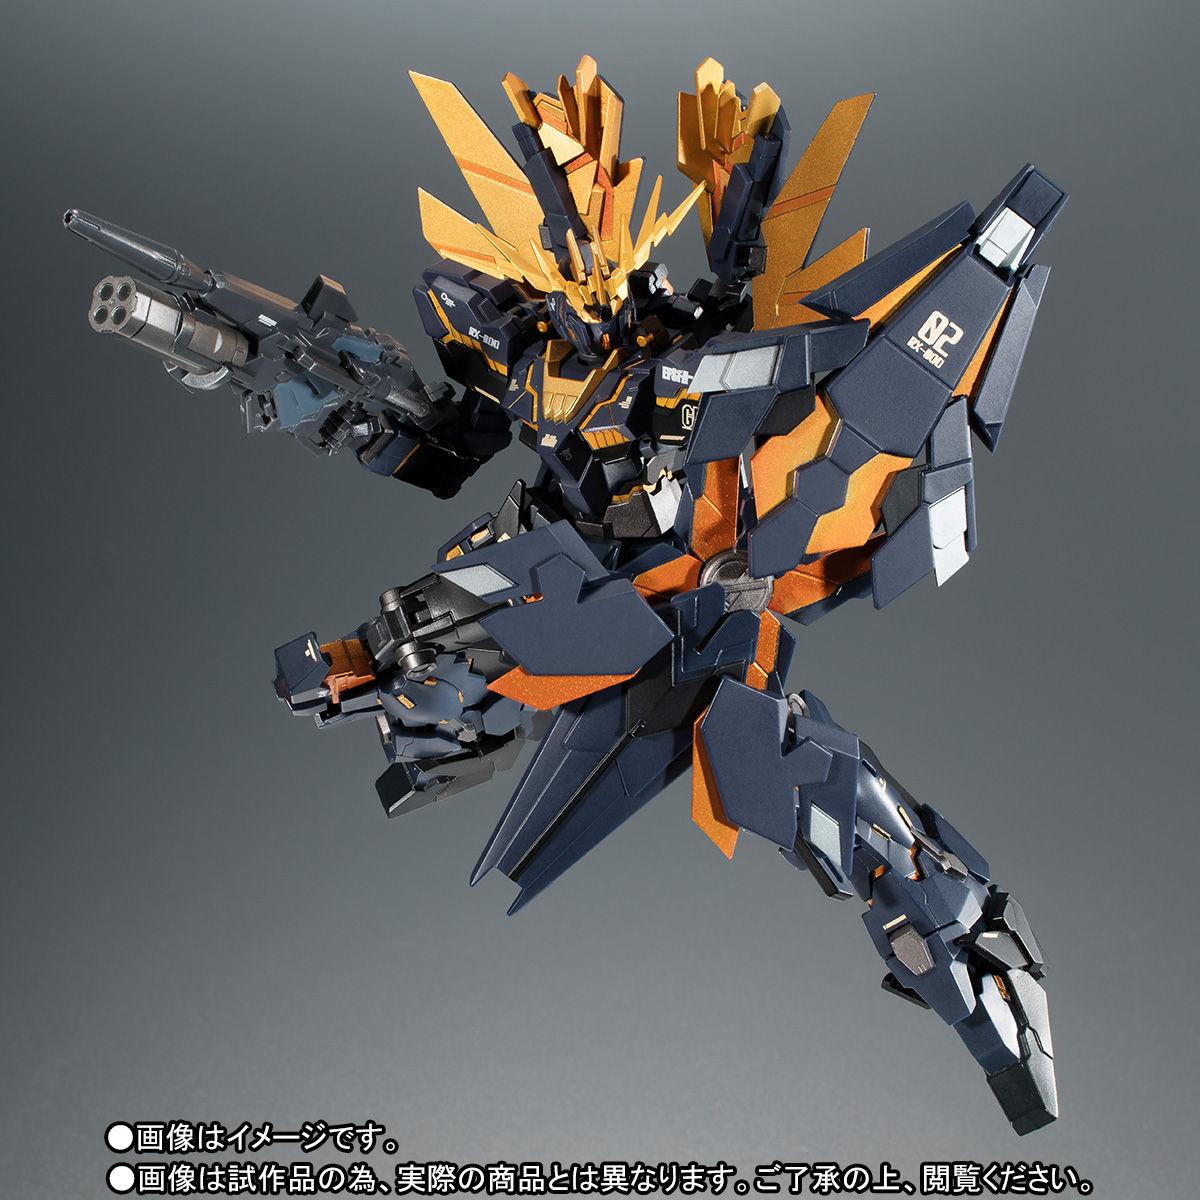 ROBOT魂〈SIDE MS〉『バンシィ・ノルン SPパック リアルマーキングVer.』可動フィギュア-002